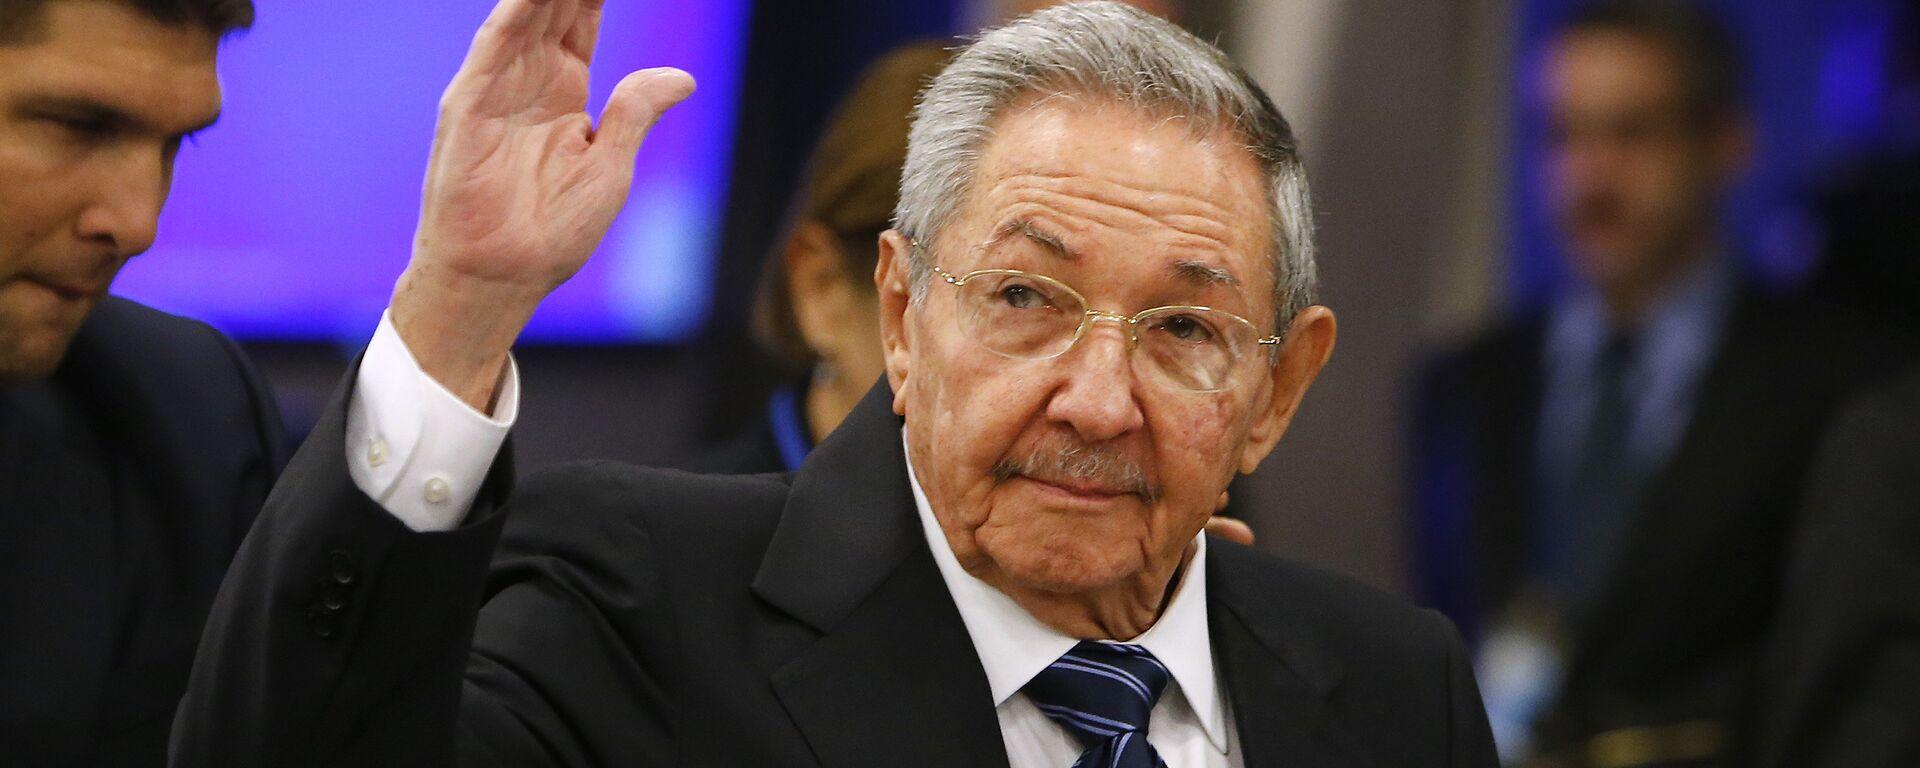 Raúl Castro, presidente de Cuba - Sputnik Mundo, 1920, 19.04.2021